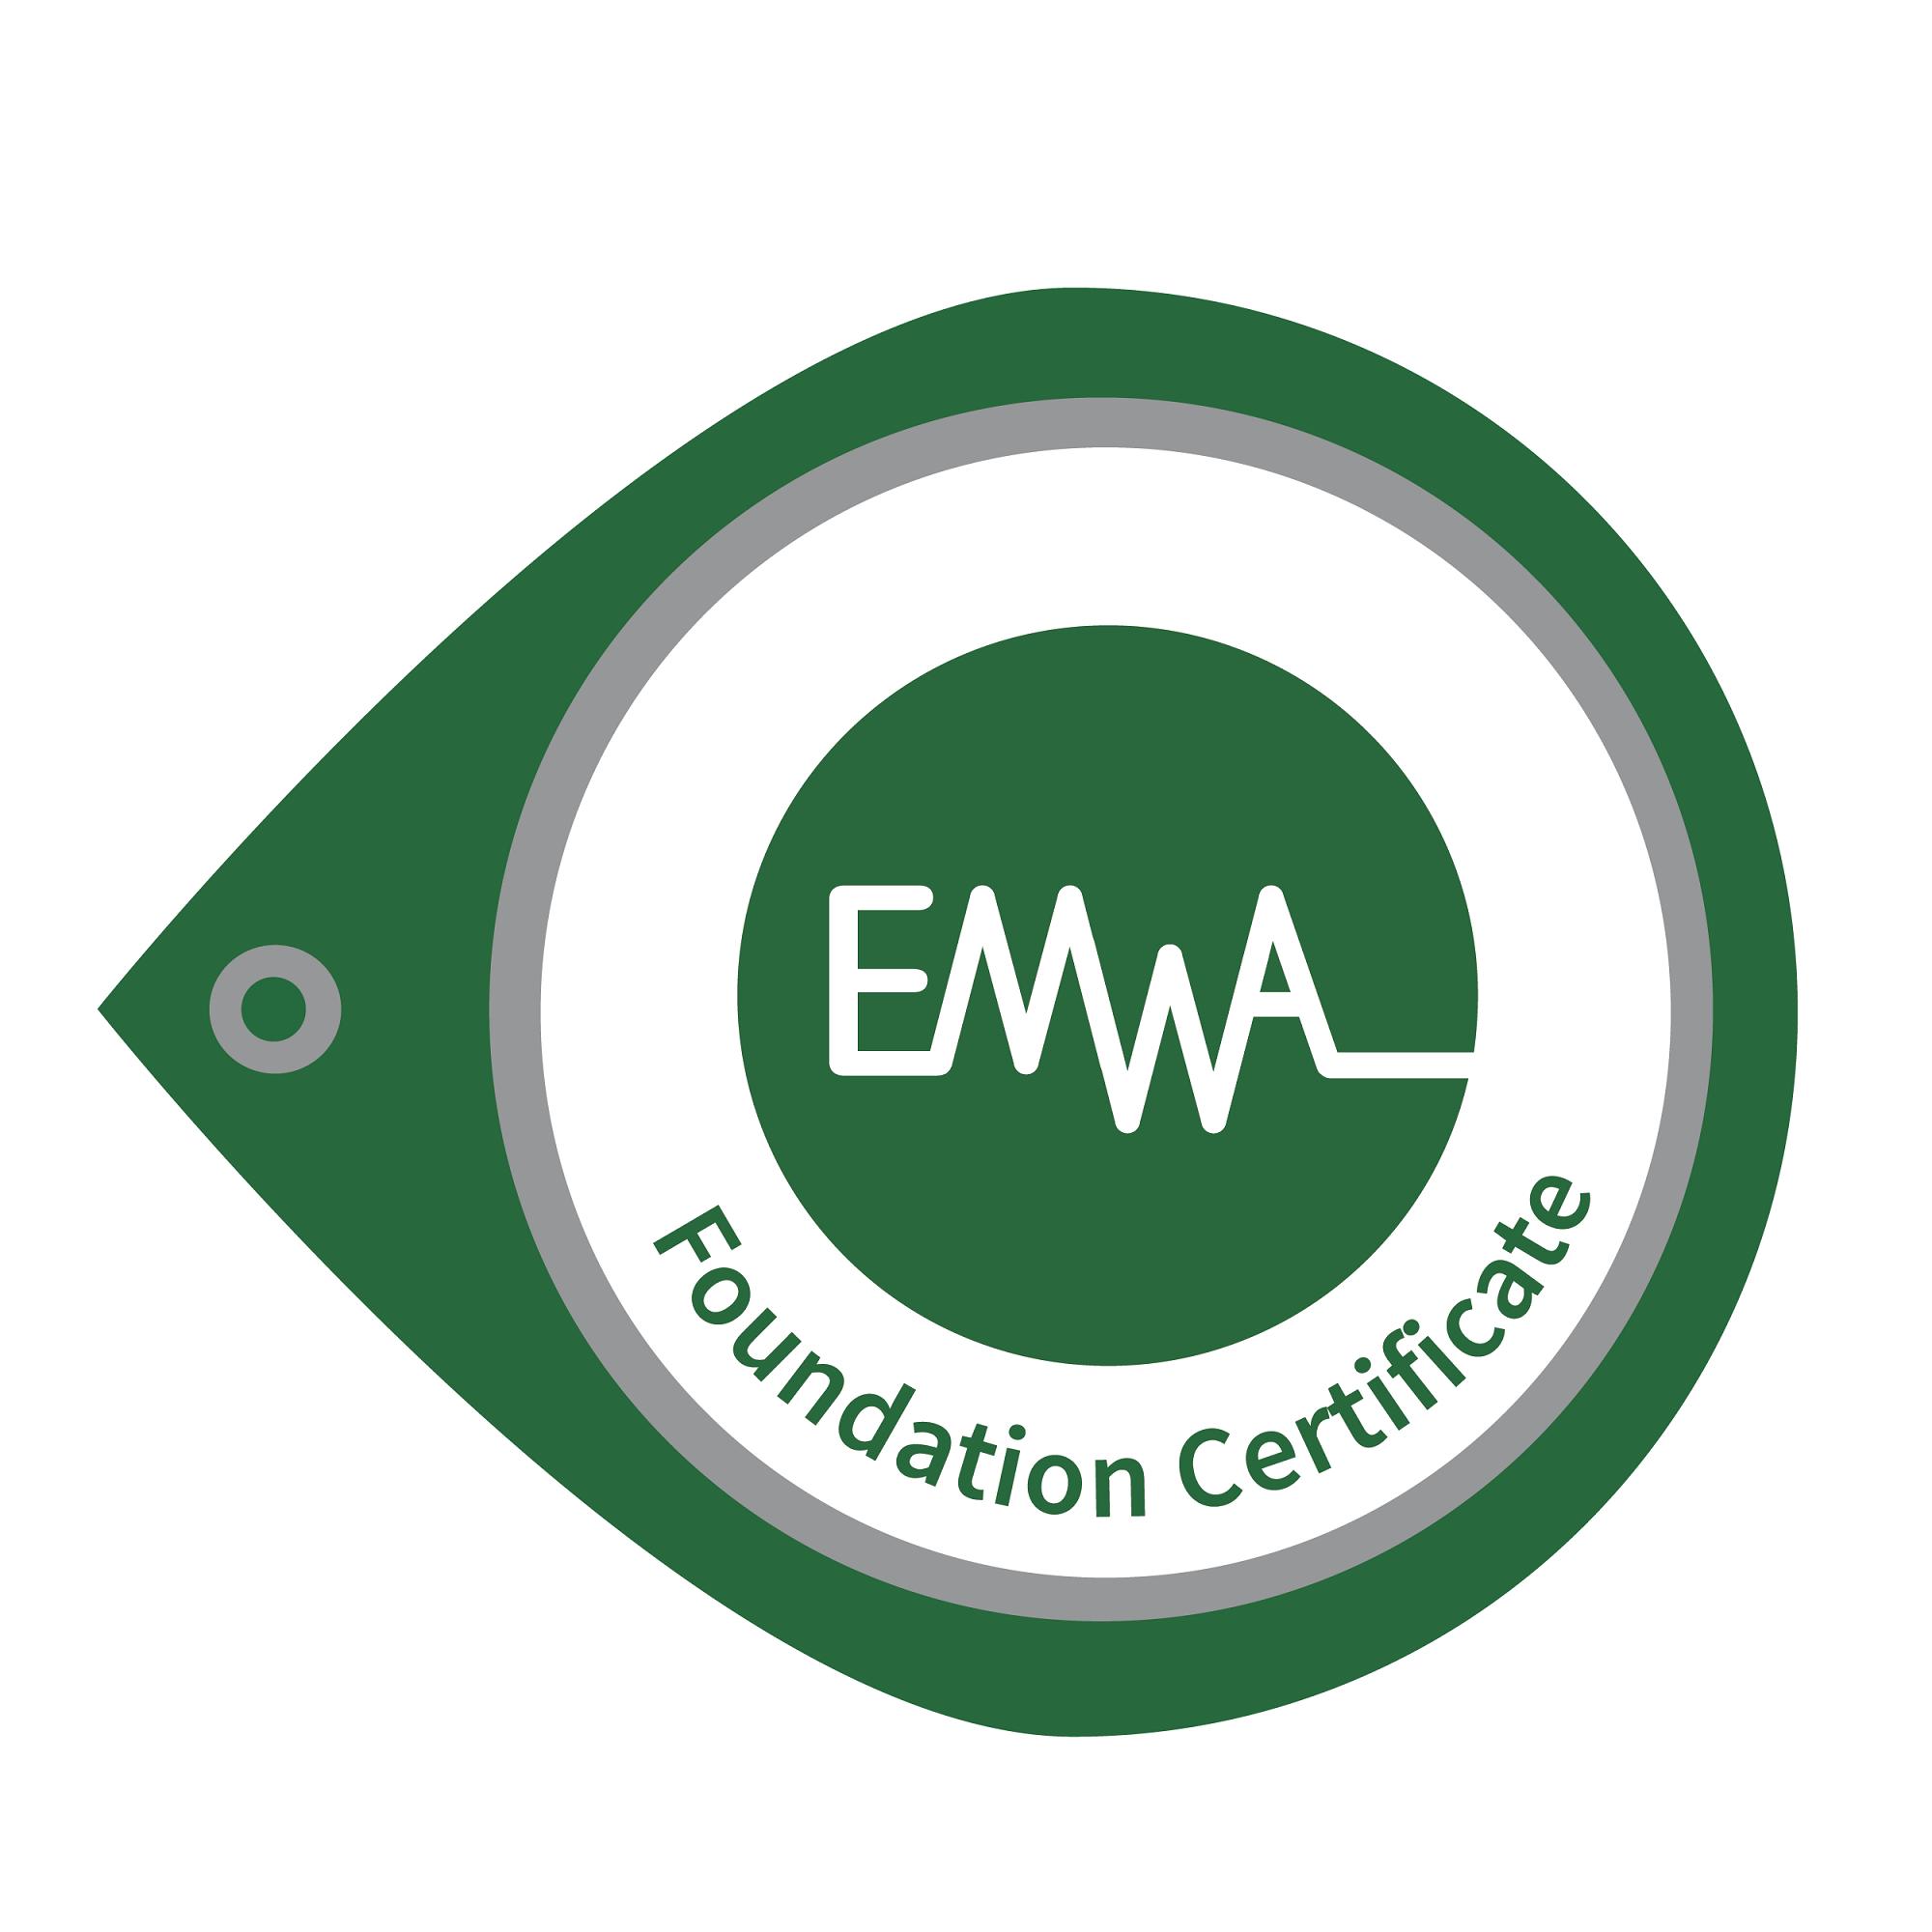 EMWA Foundation Certificate